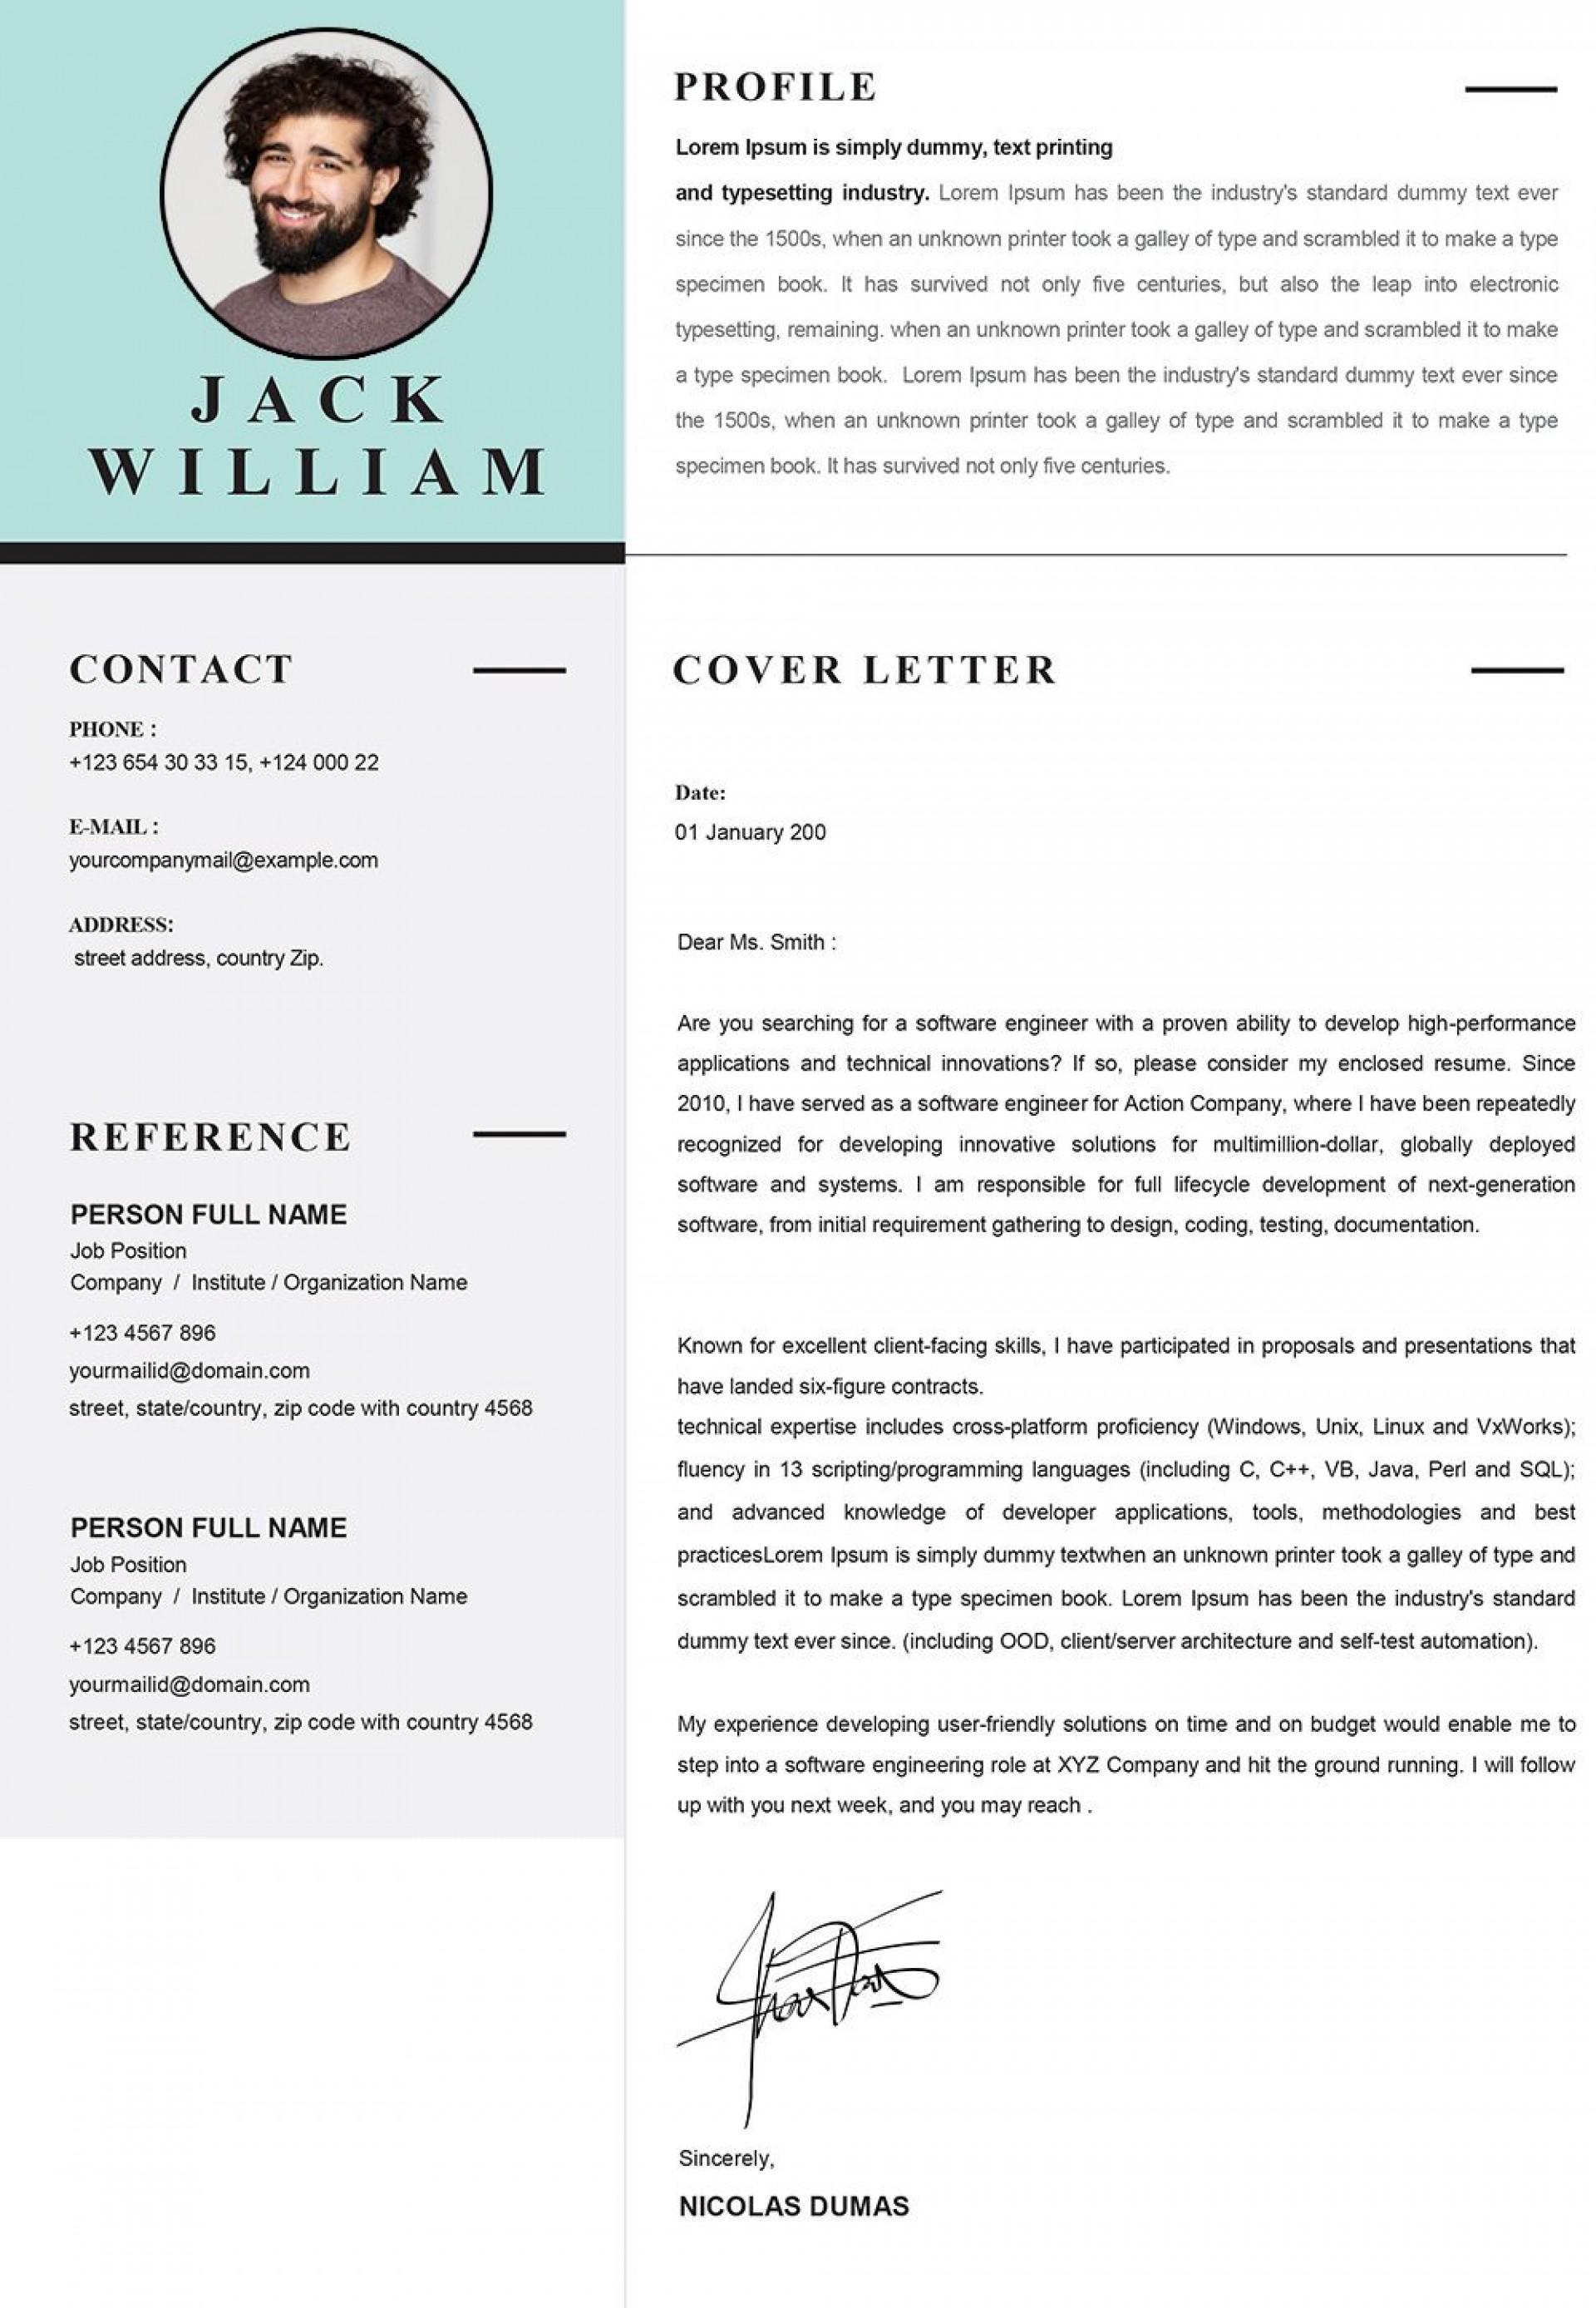 005 Marvelou Microsoft Cover Letter Template 2020 Idea 1920